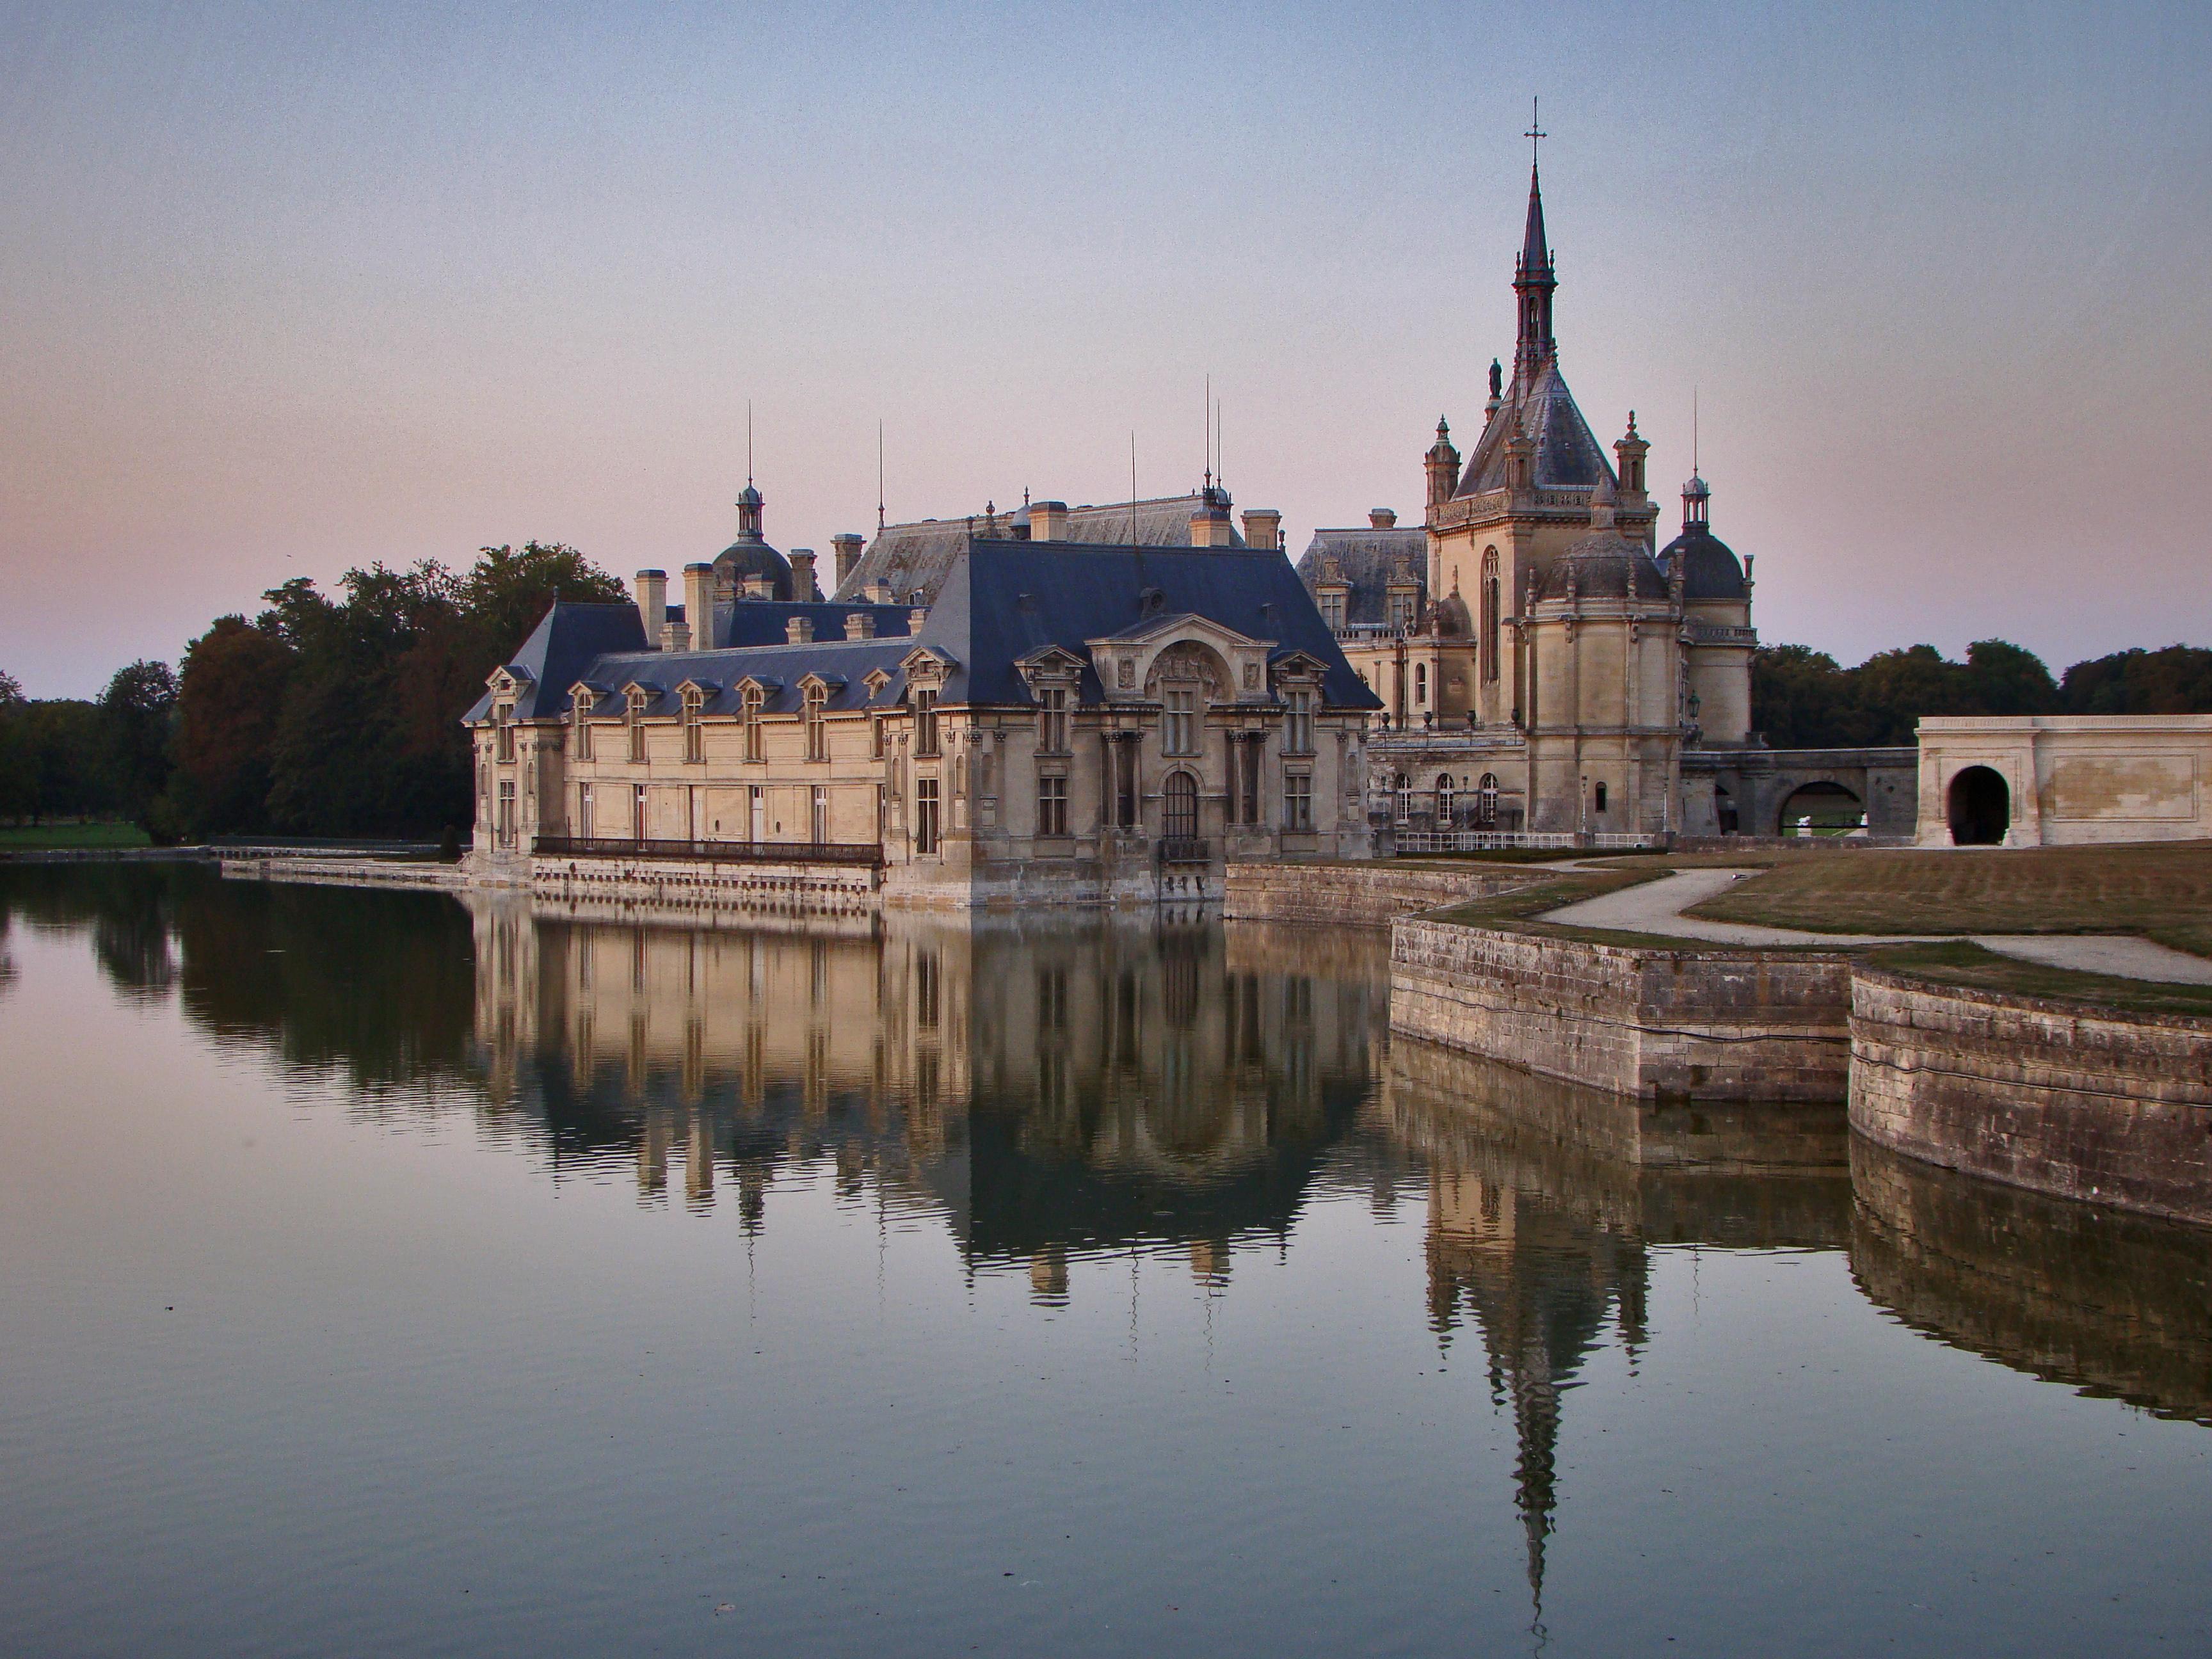 Chateau de Chantilly, Chantilly, France скачать